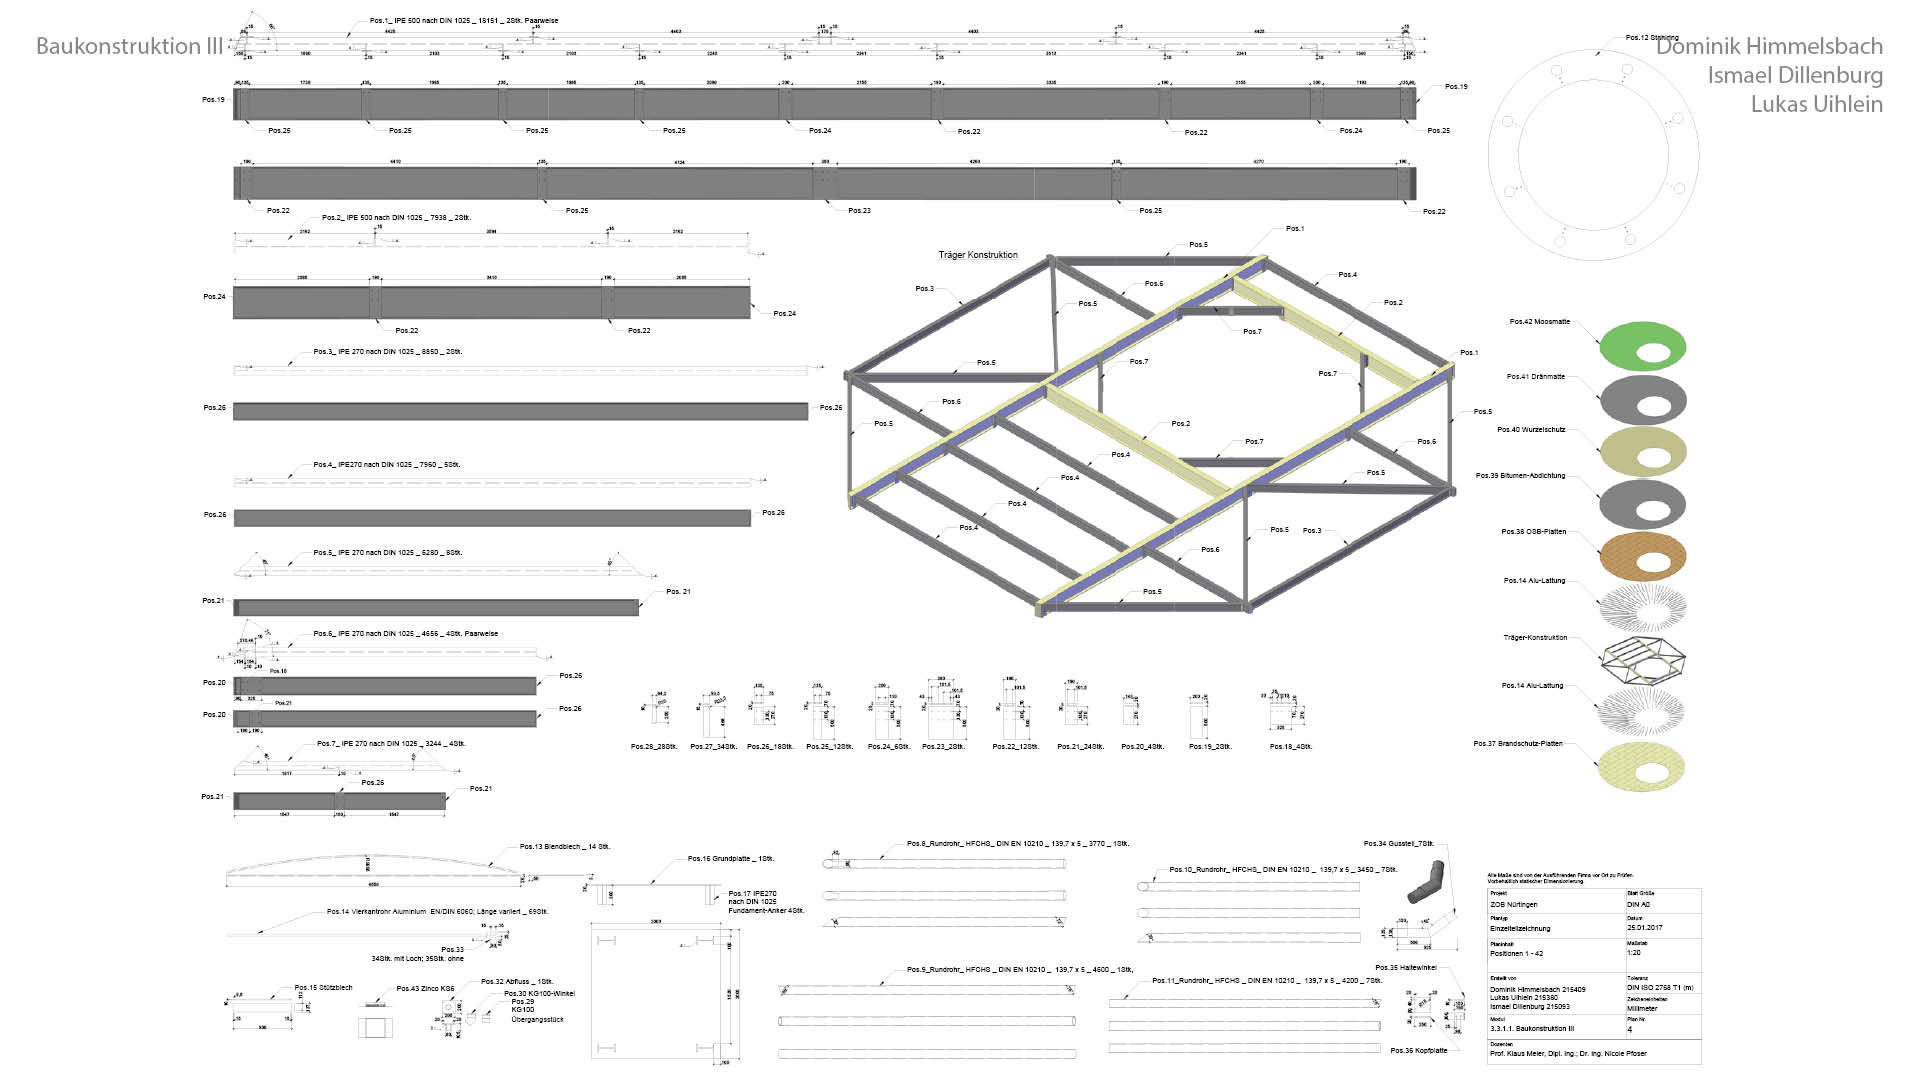 13 16 3 Baukonstruktion 3